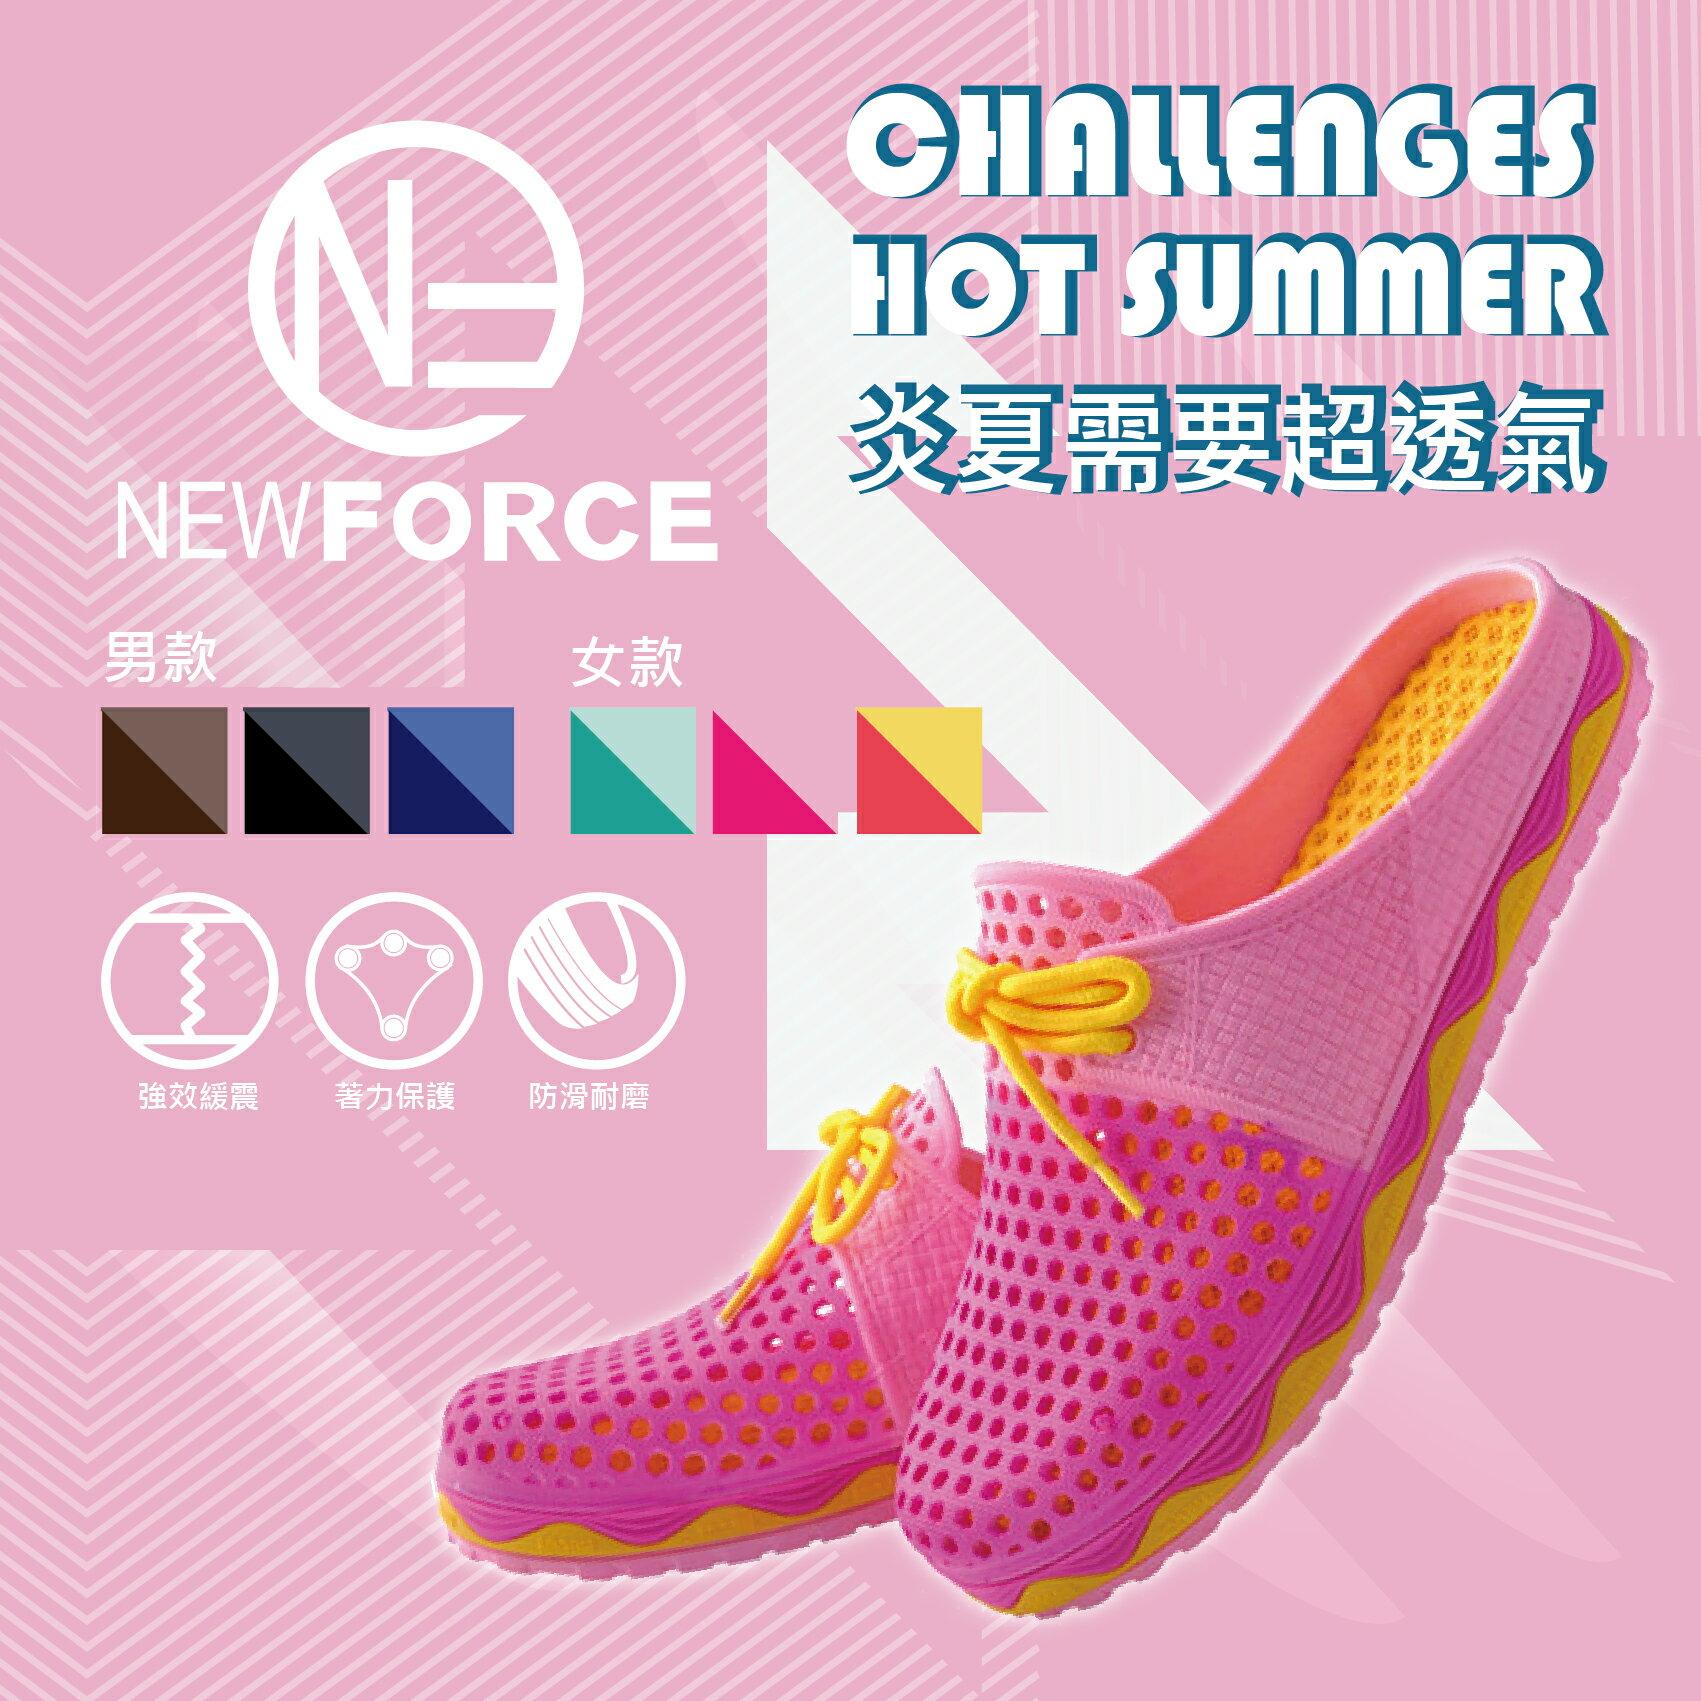 【NEW FORCE】超動感雙色軟Q洞洞鞋 - 女款/3色可選【6010108】